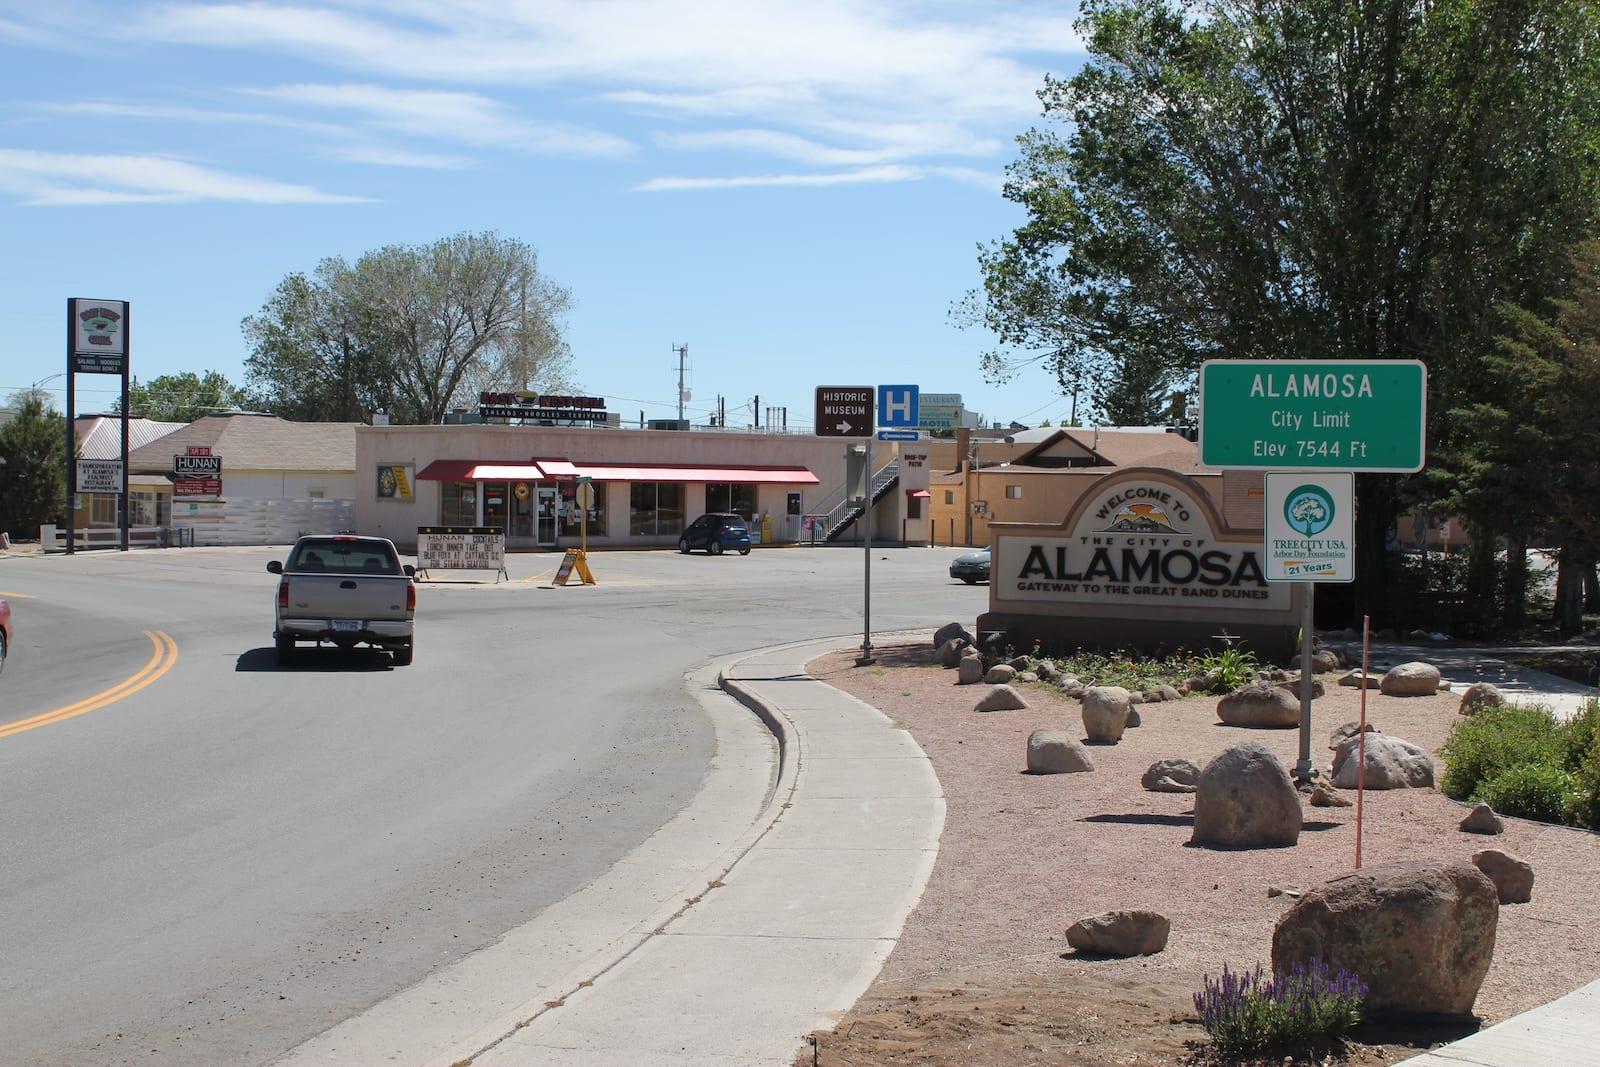 Colorado Strange Laws Alamosa City Limit